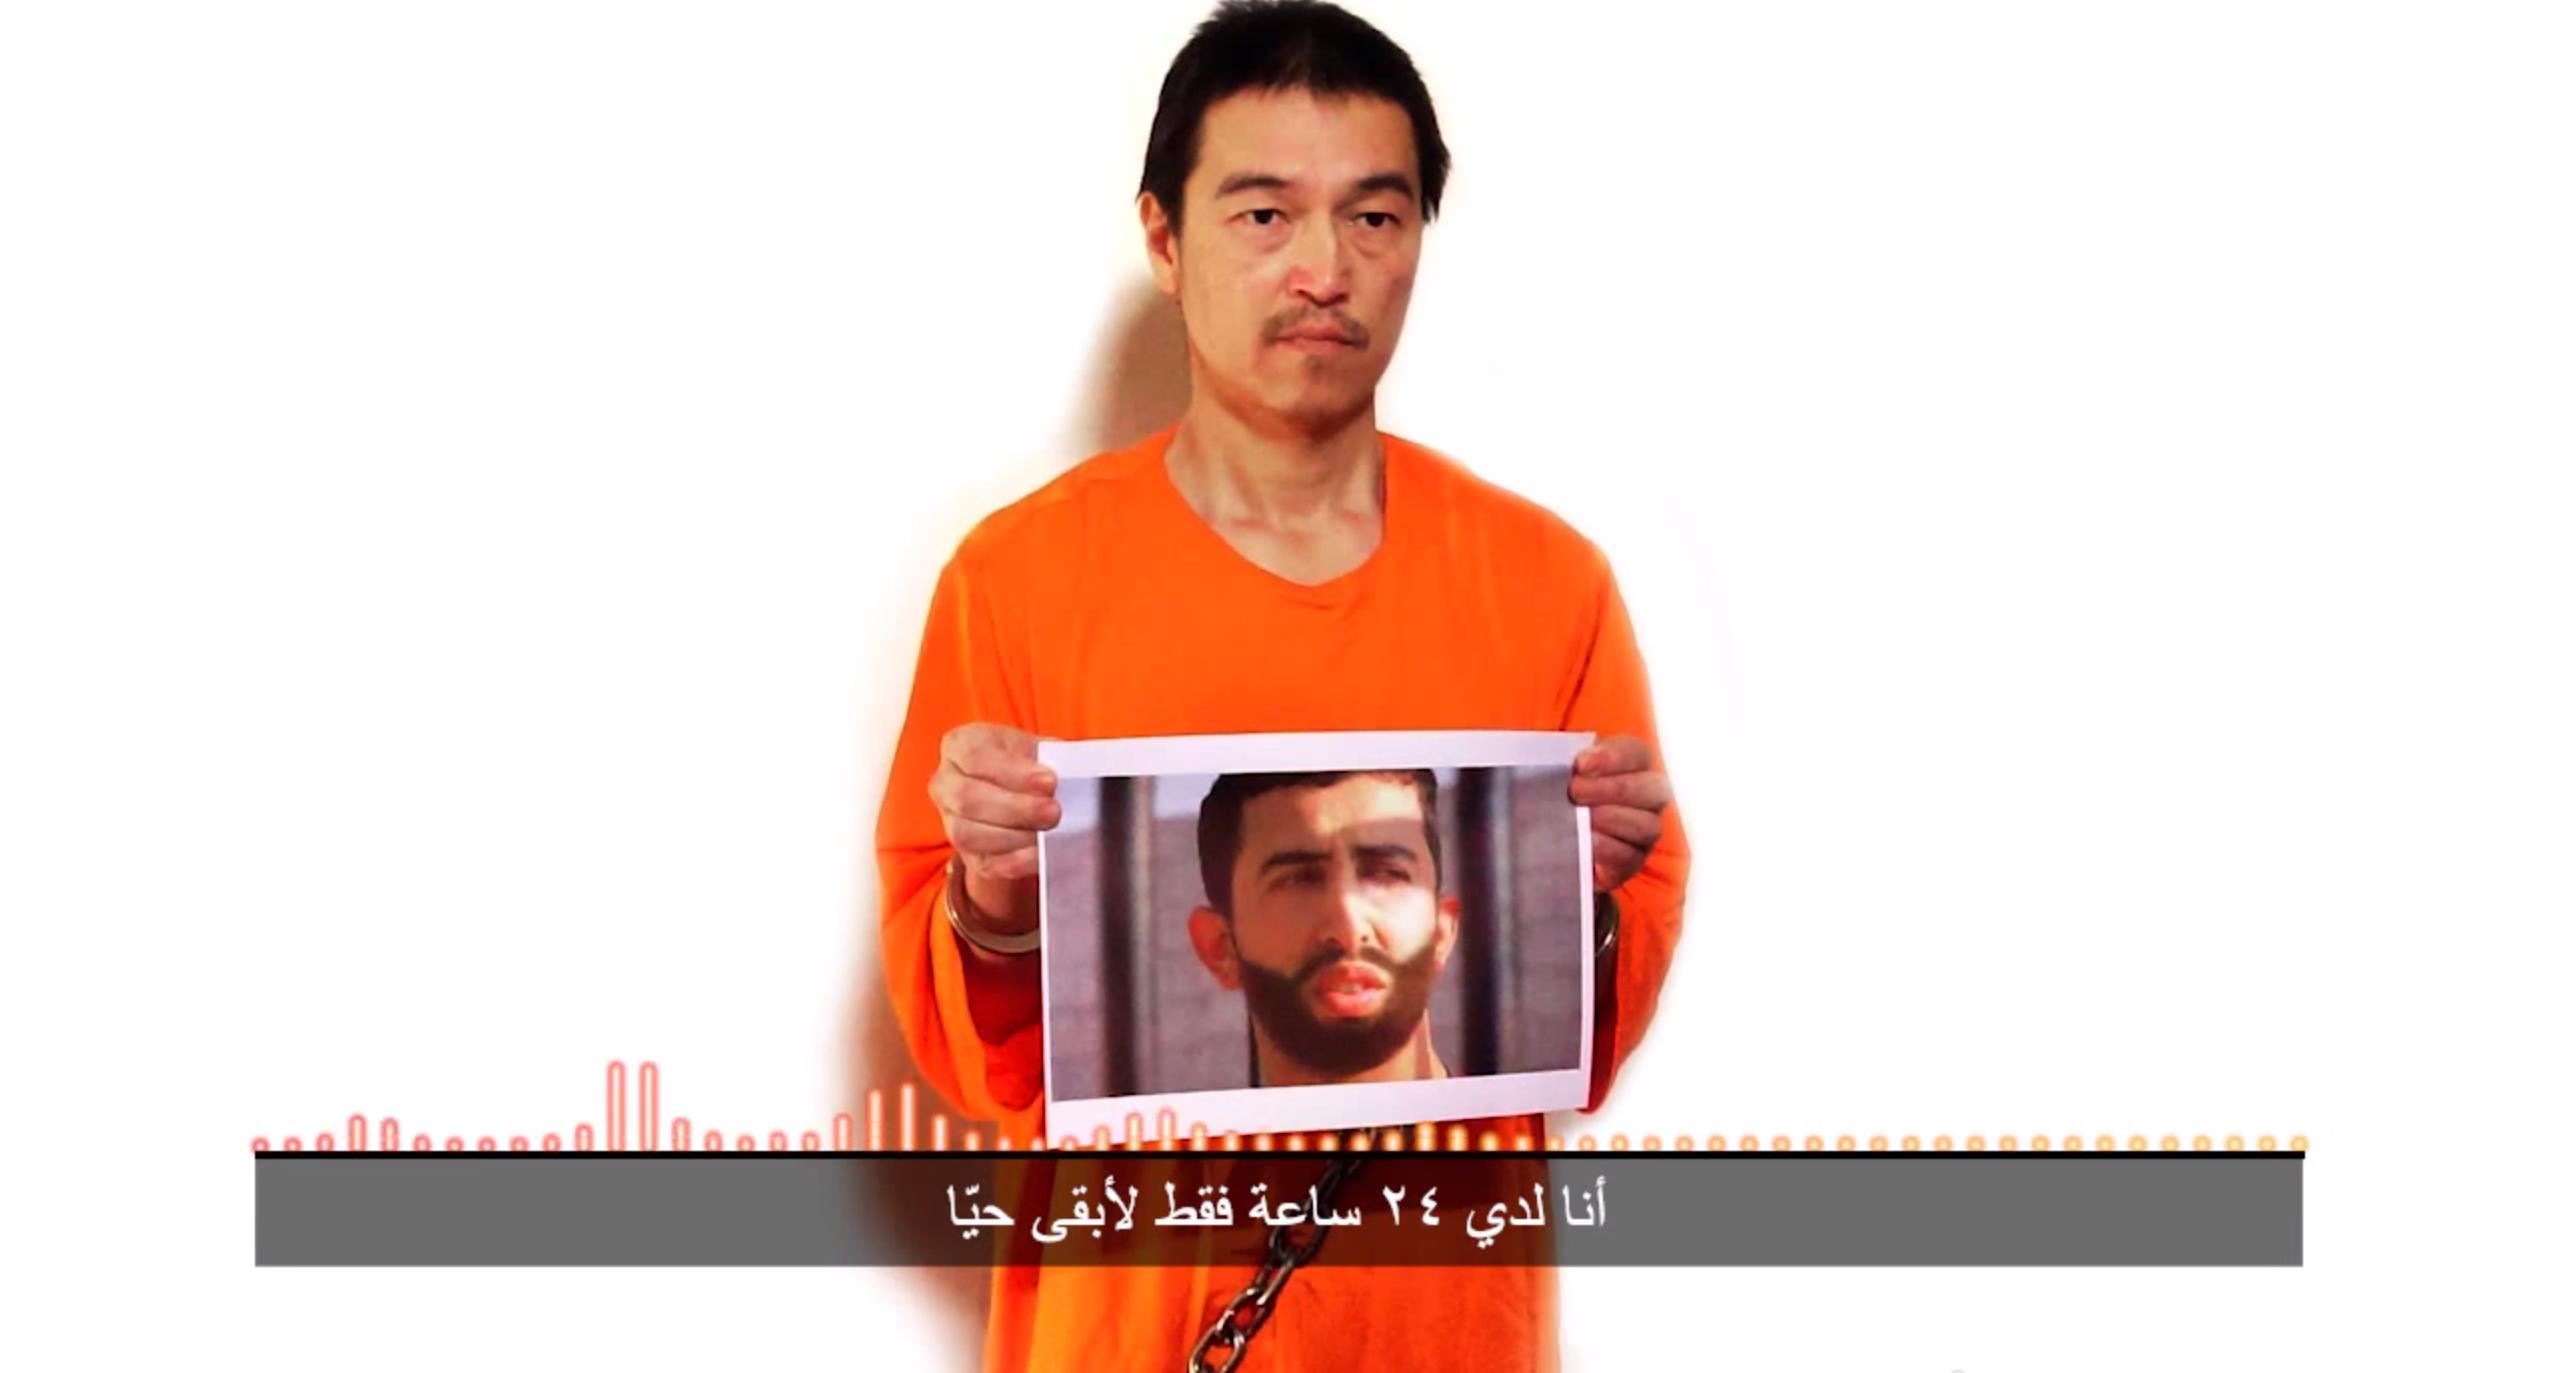 Jordan Threatens to Execute IS Prisoners if Hostage Isn't Released